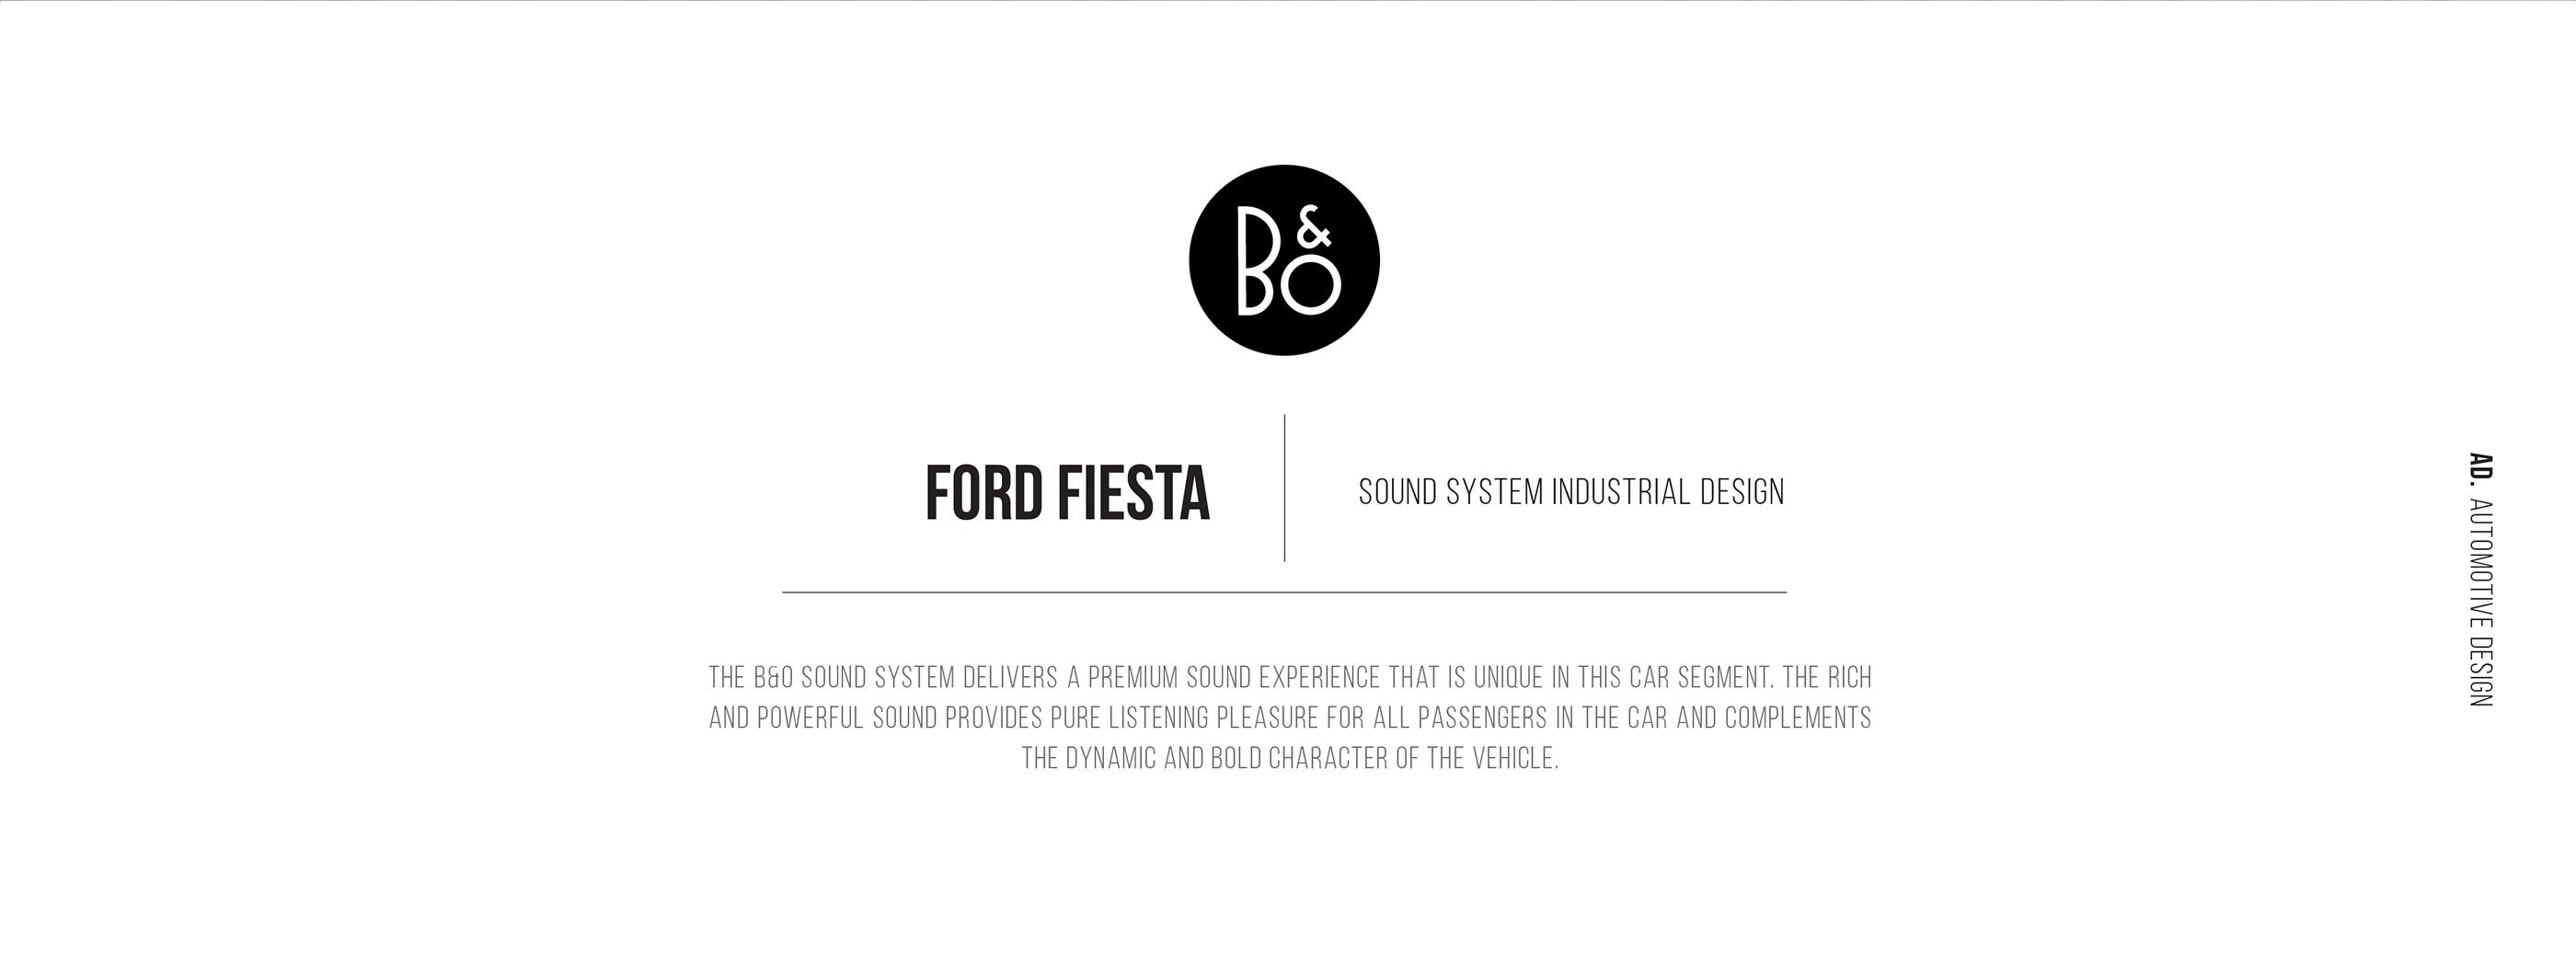 B&O X Ford Fiesta on Behance